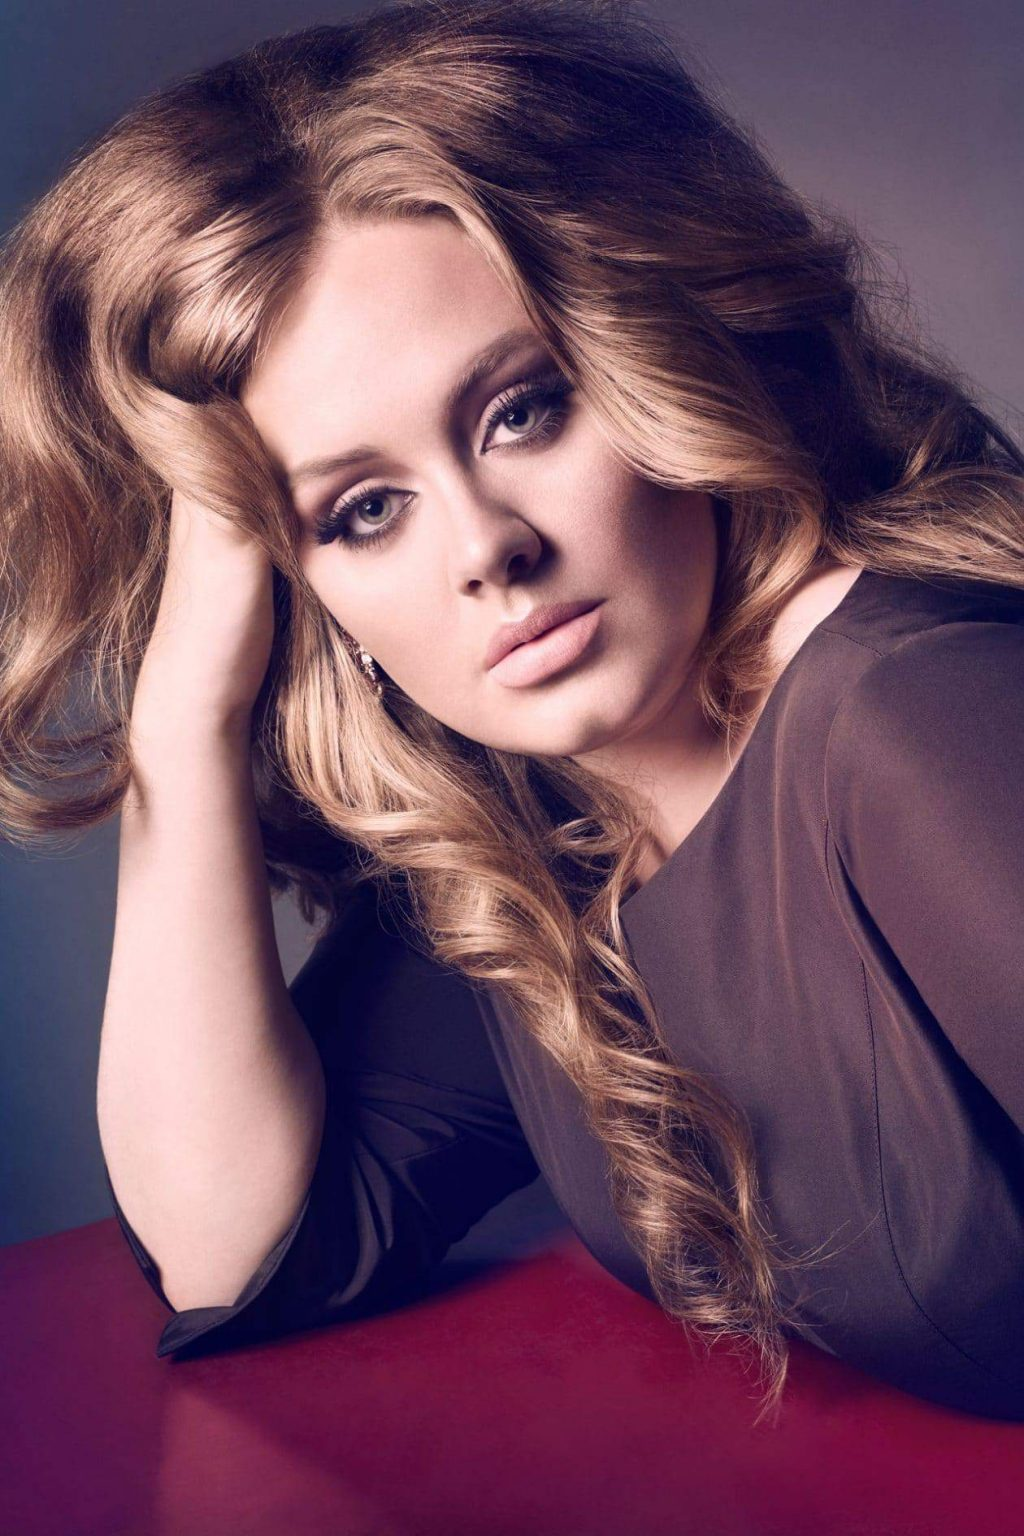 Adele Shot by Solve Sundsbo